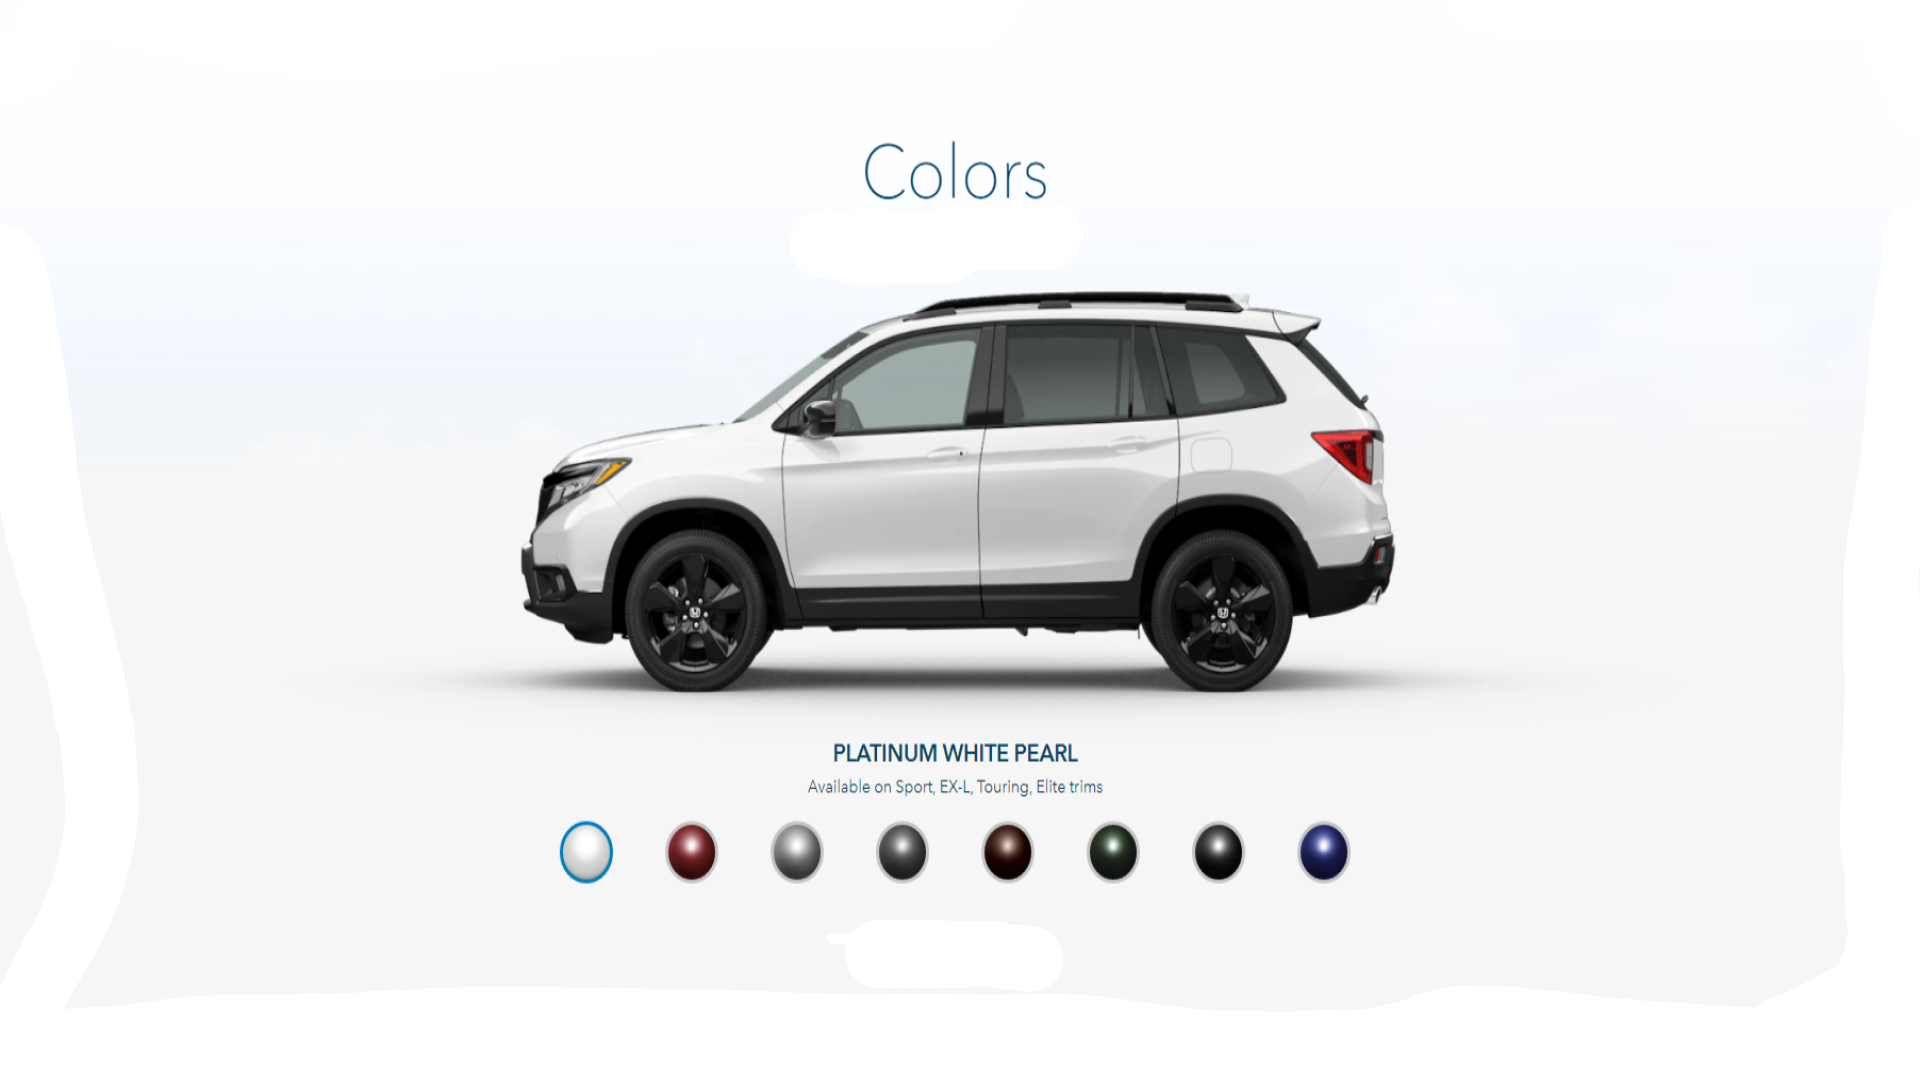 2020 Honda Passport Exterior Colors